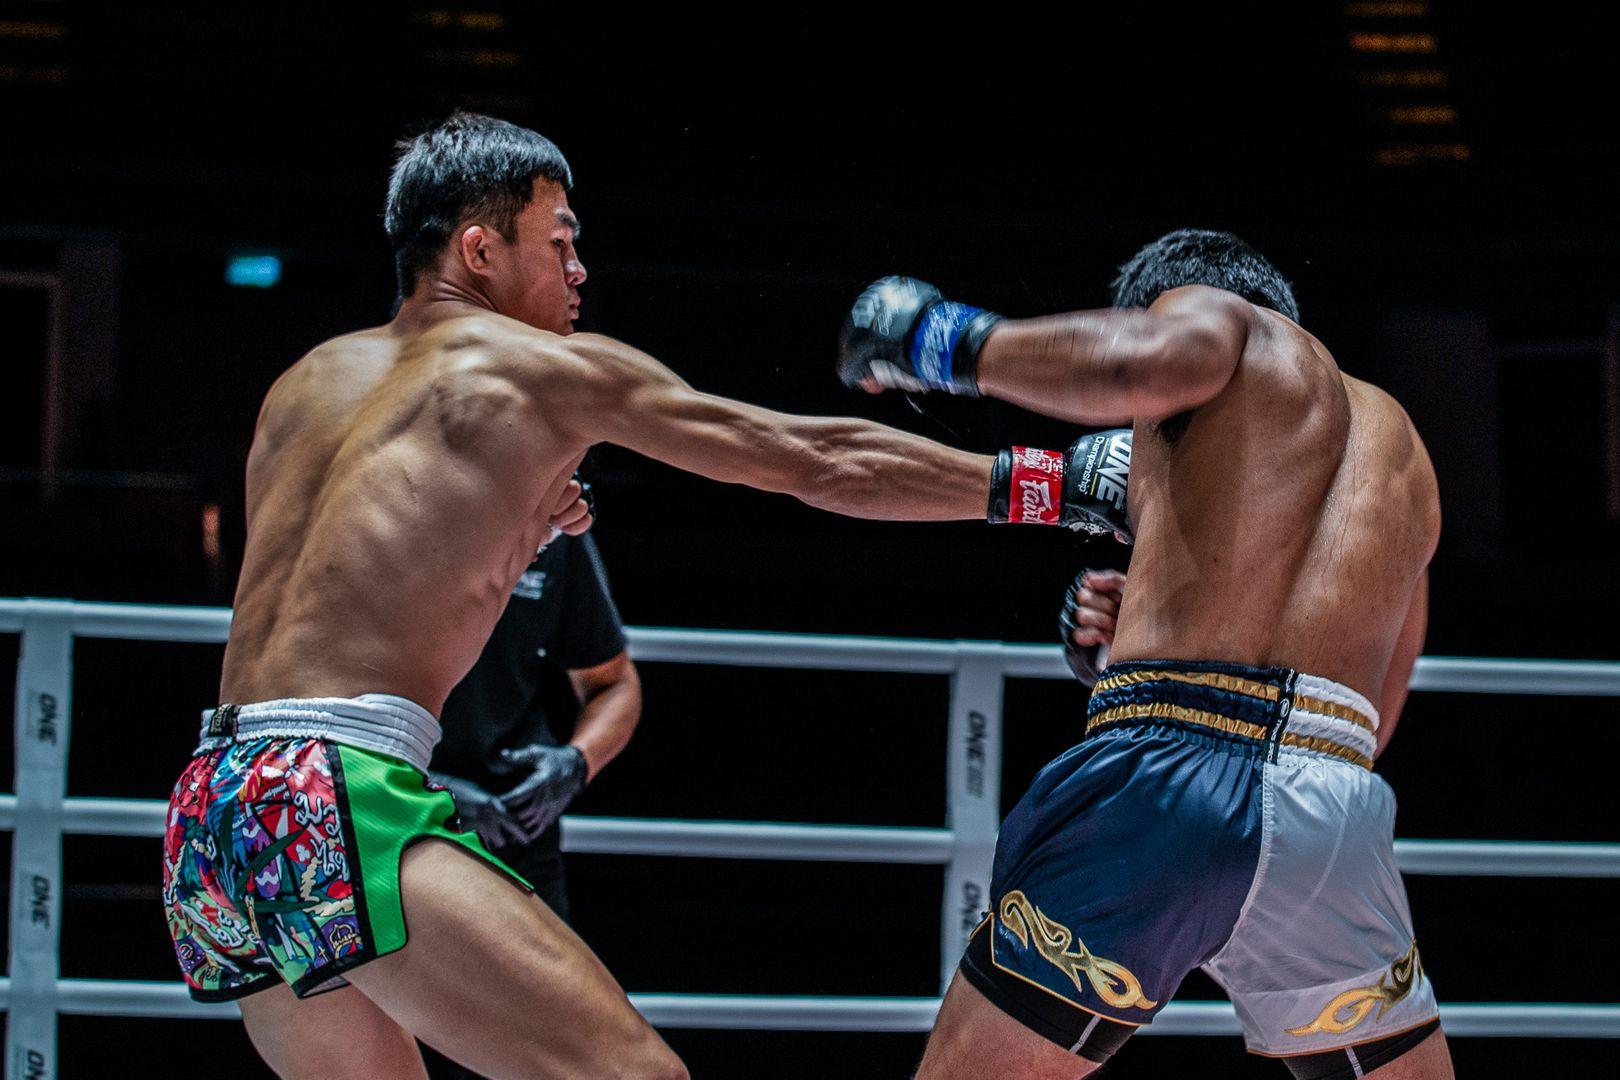 Muay Thai fighter Saemapetch Fairtex hits Rodlek in the ribs